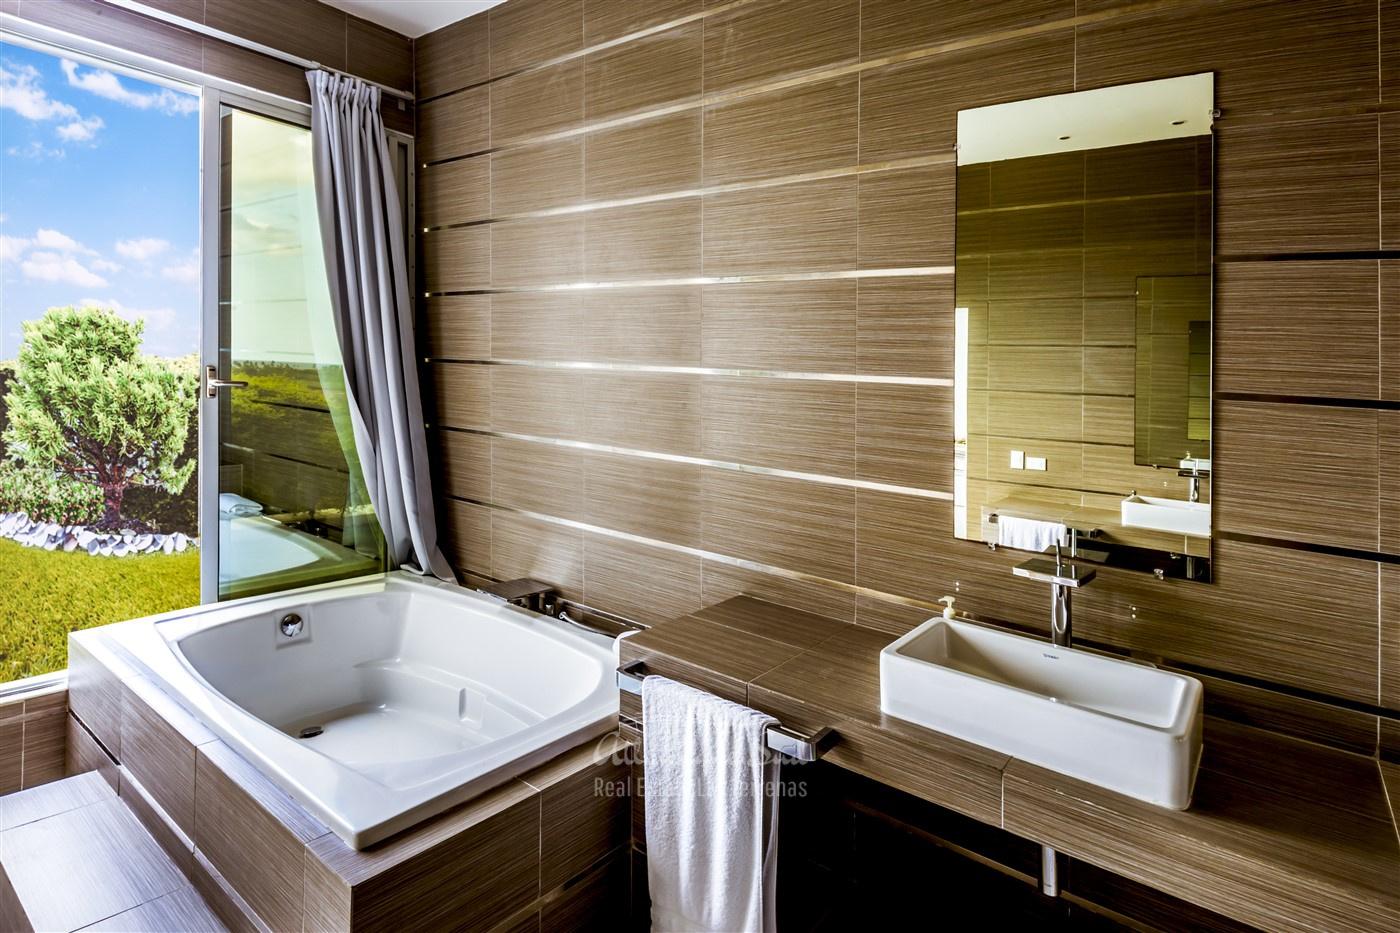 Modern Villa on a hill with ocean views Real Estate Las Terrenas Dominican Republic16.jpg